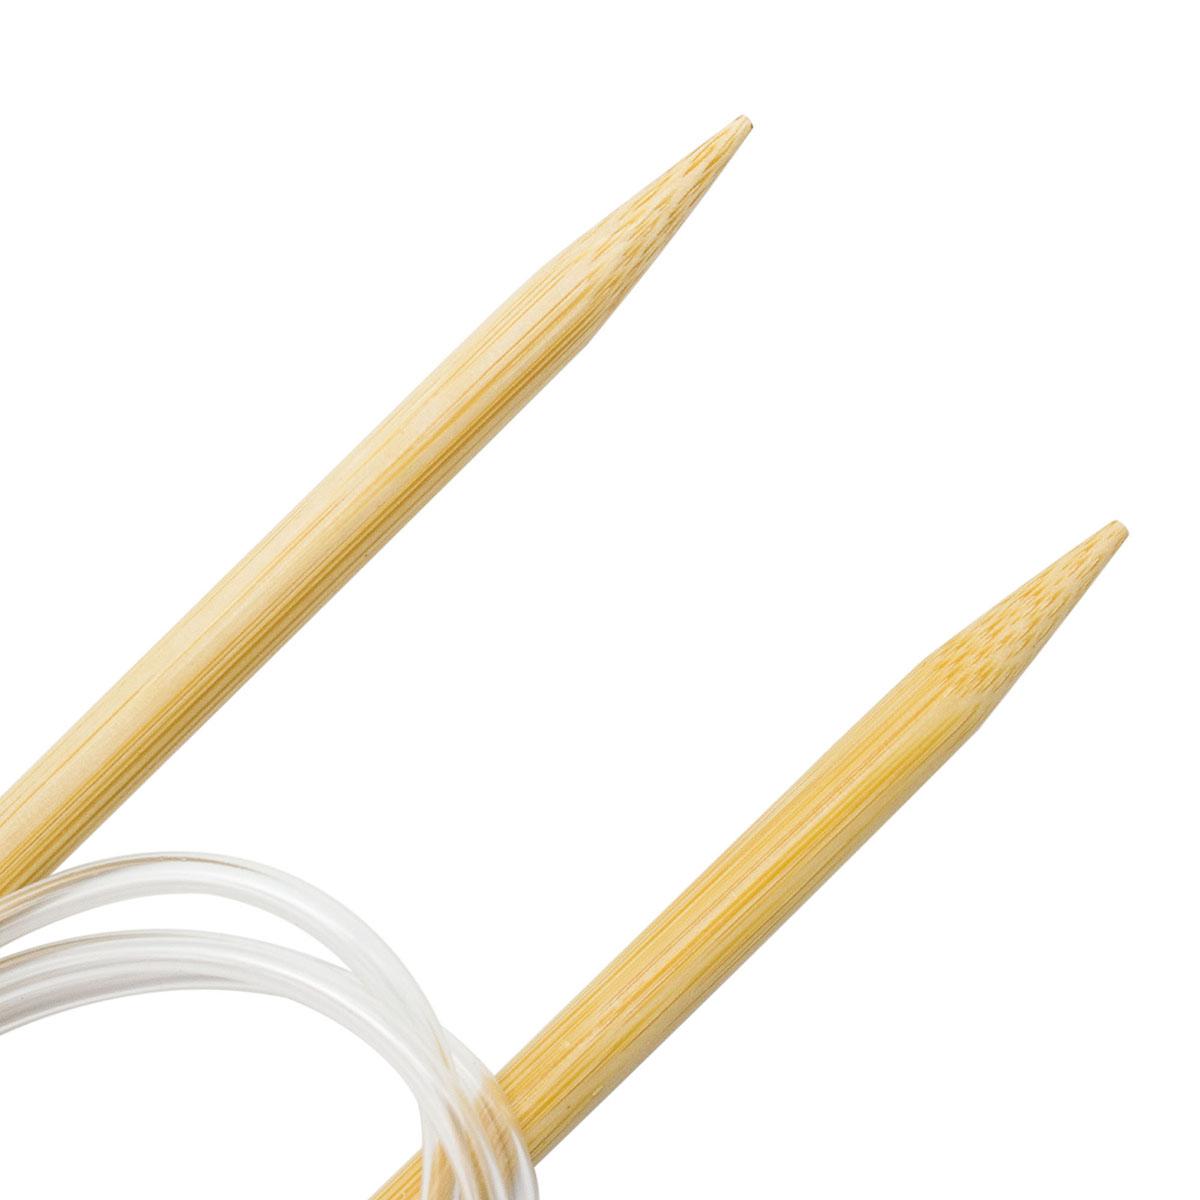 Спицы круговые бамбук 942180, 100 см, 8,0 мм, Hobby&Pro